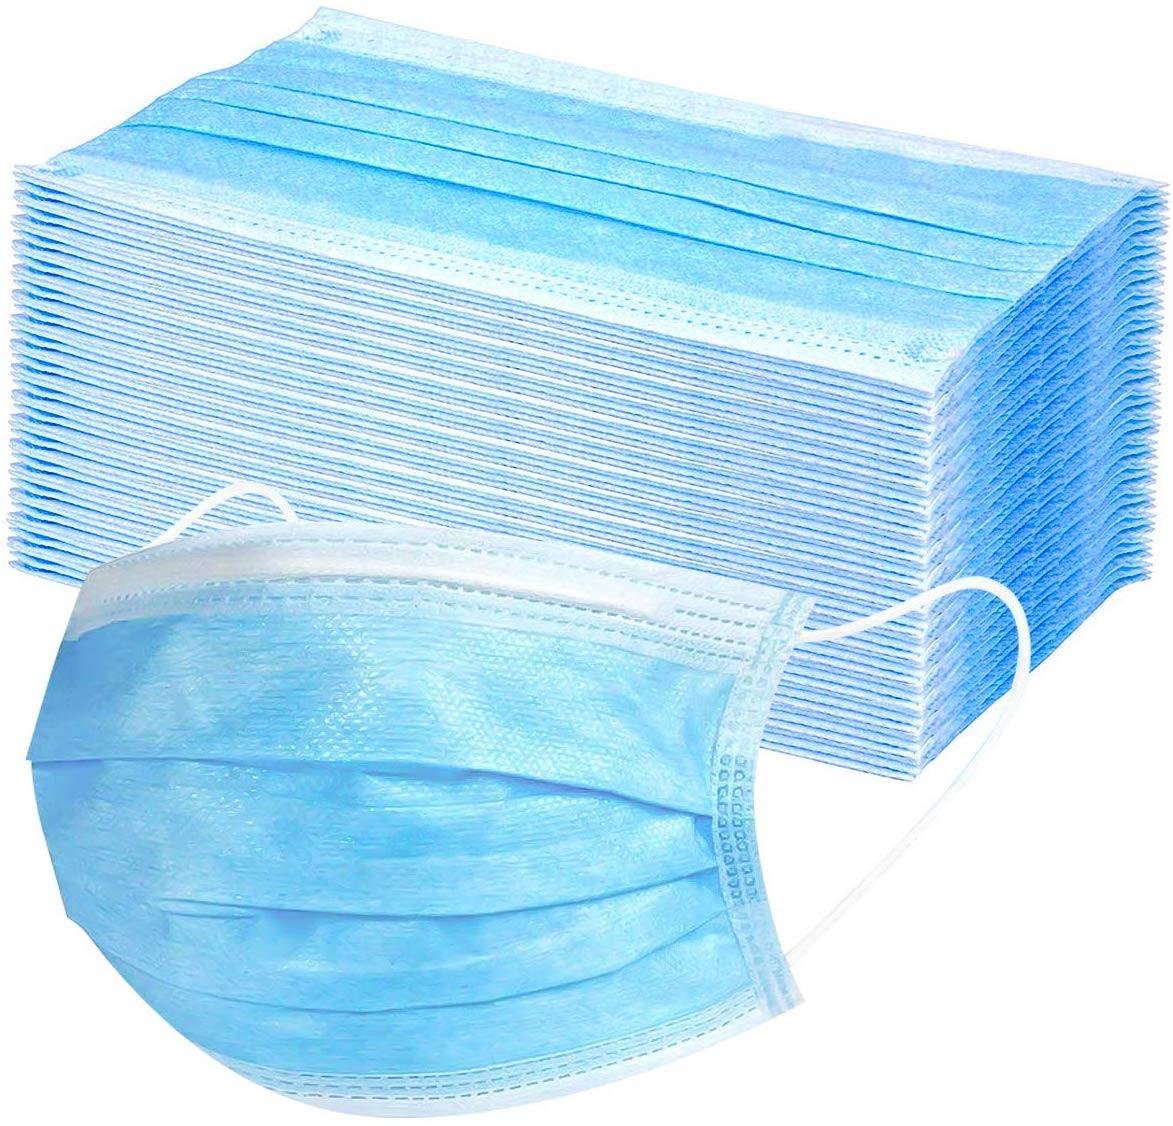 Disposable Non-Medical Mask (USA Direct Shipping)